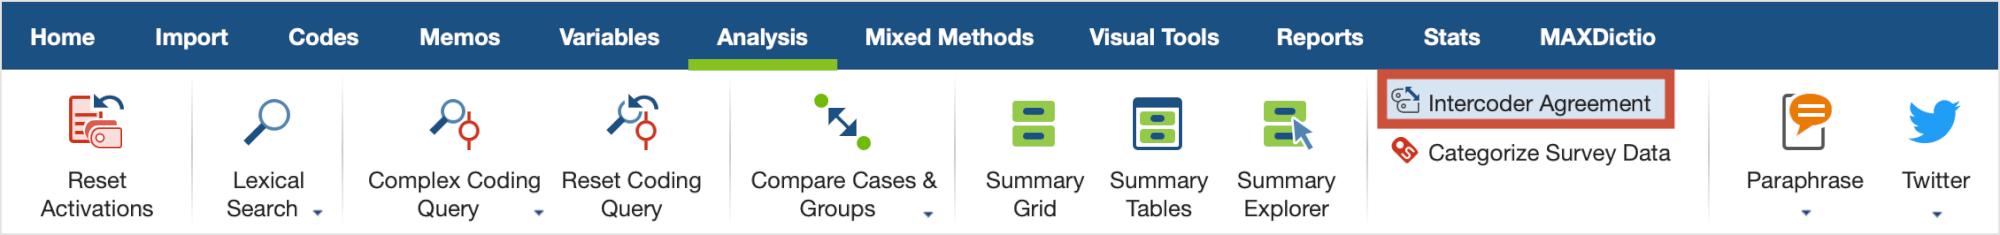 Starting the Intercoder Agreement function via the Analysis menu